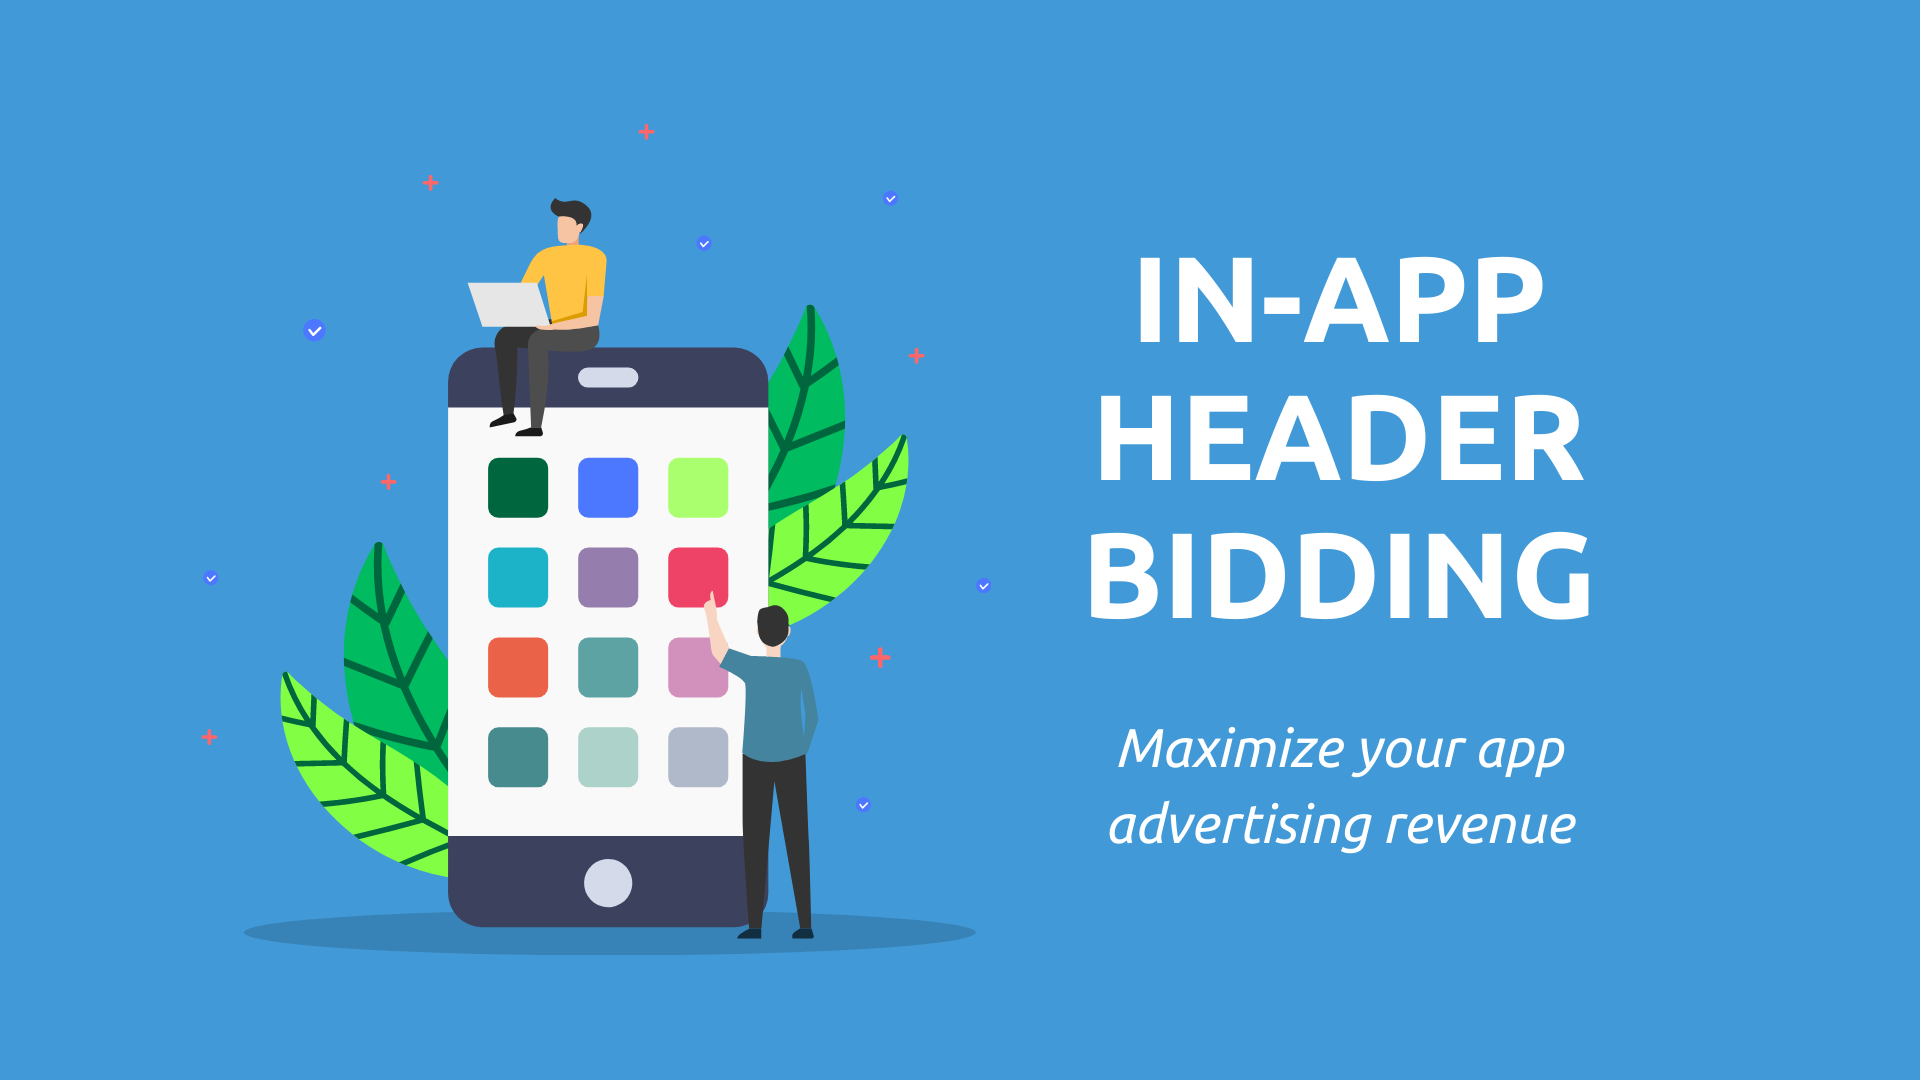 How In-App Header Bidding Works